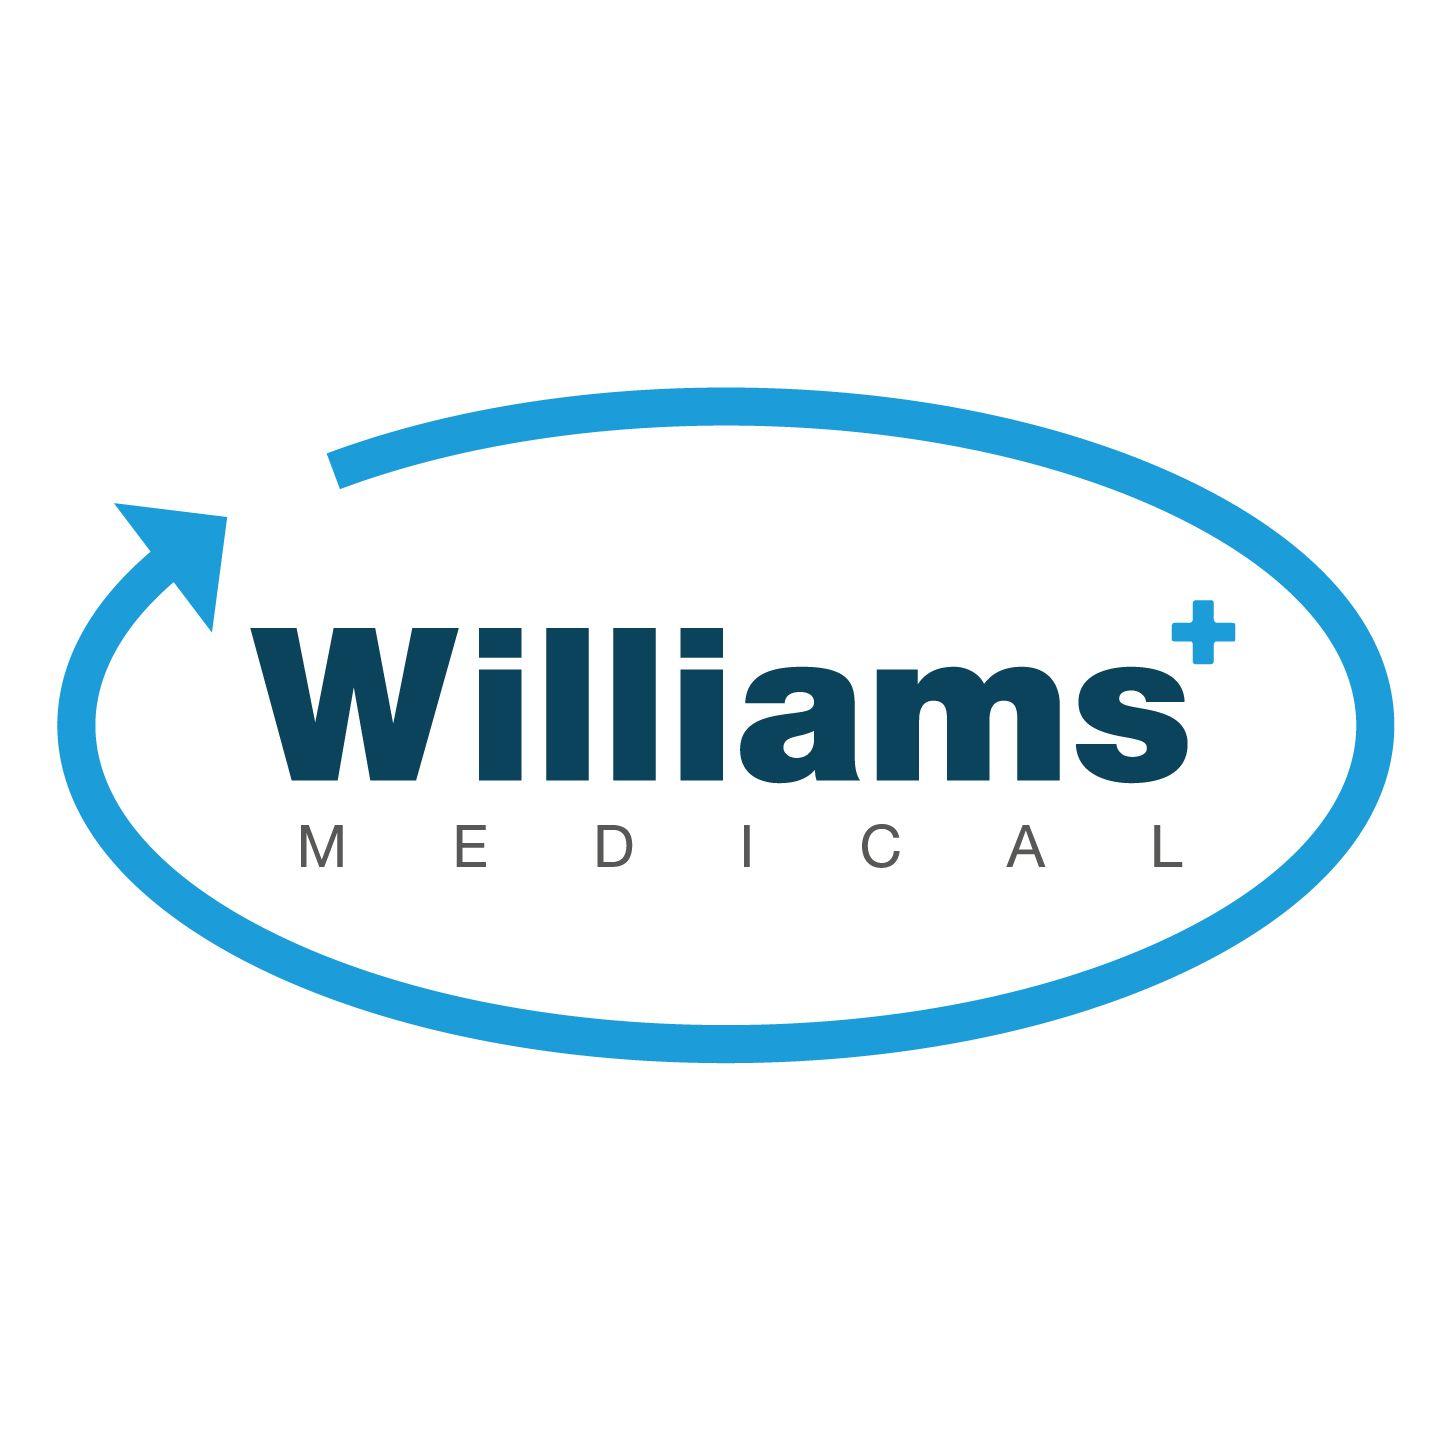 Williams Medical Supplies